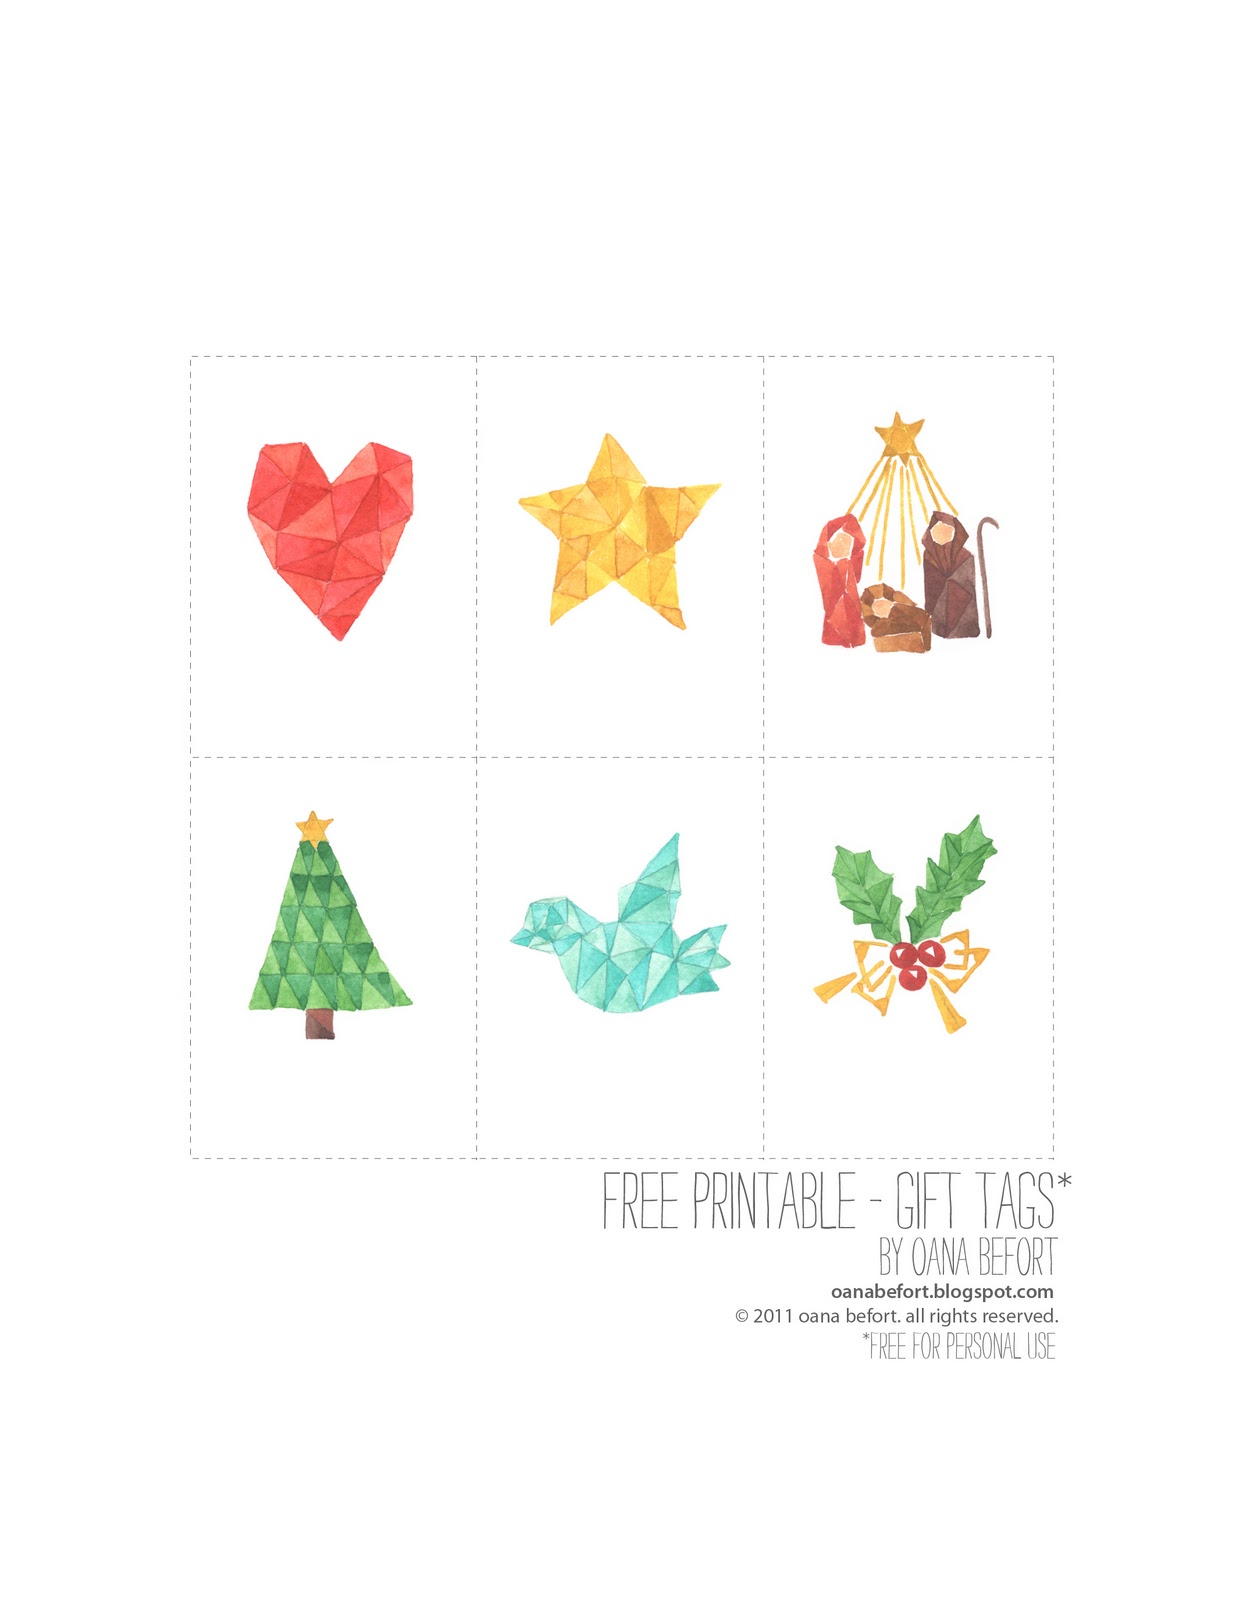 http://3.bp.blogspot.com/-lLVUwCmeGyc/TudRAKVmeVI/AAAAAAAAAN0/dSlqPrndkQs/s1600/gift+tags_by+oanabefort_free.jpg